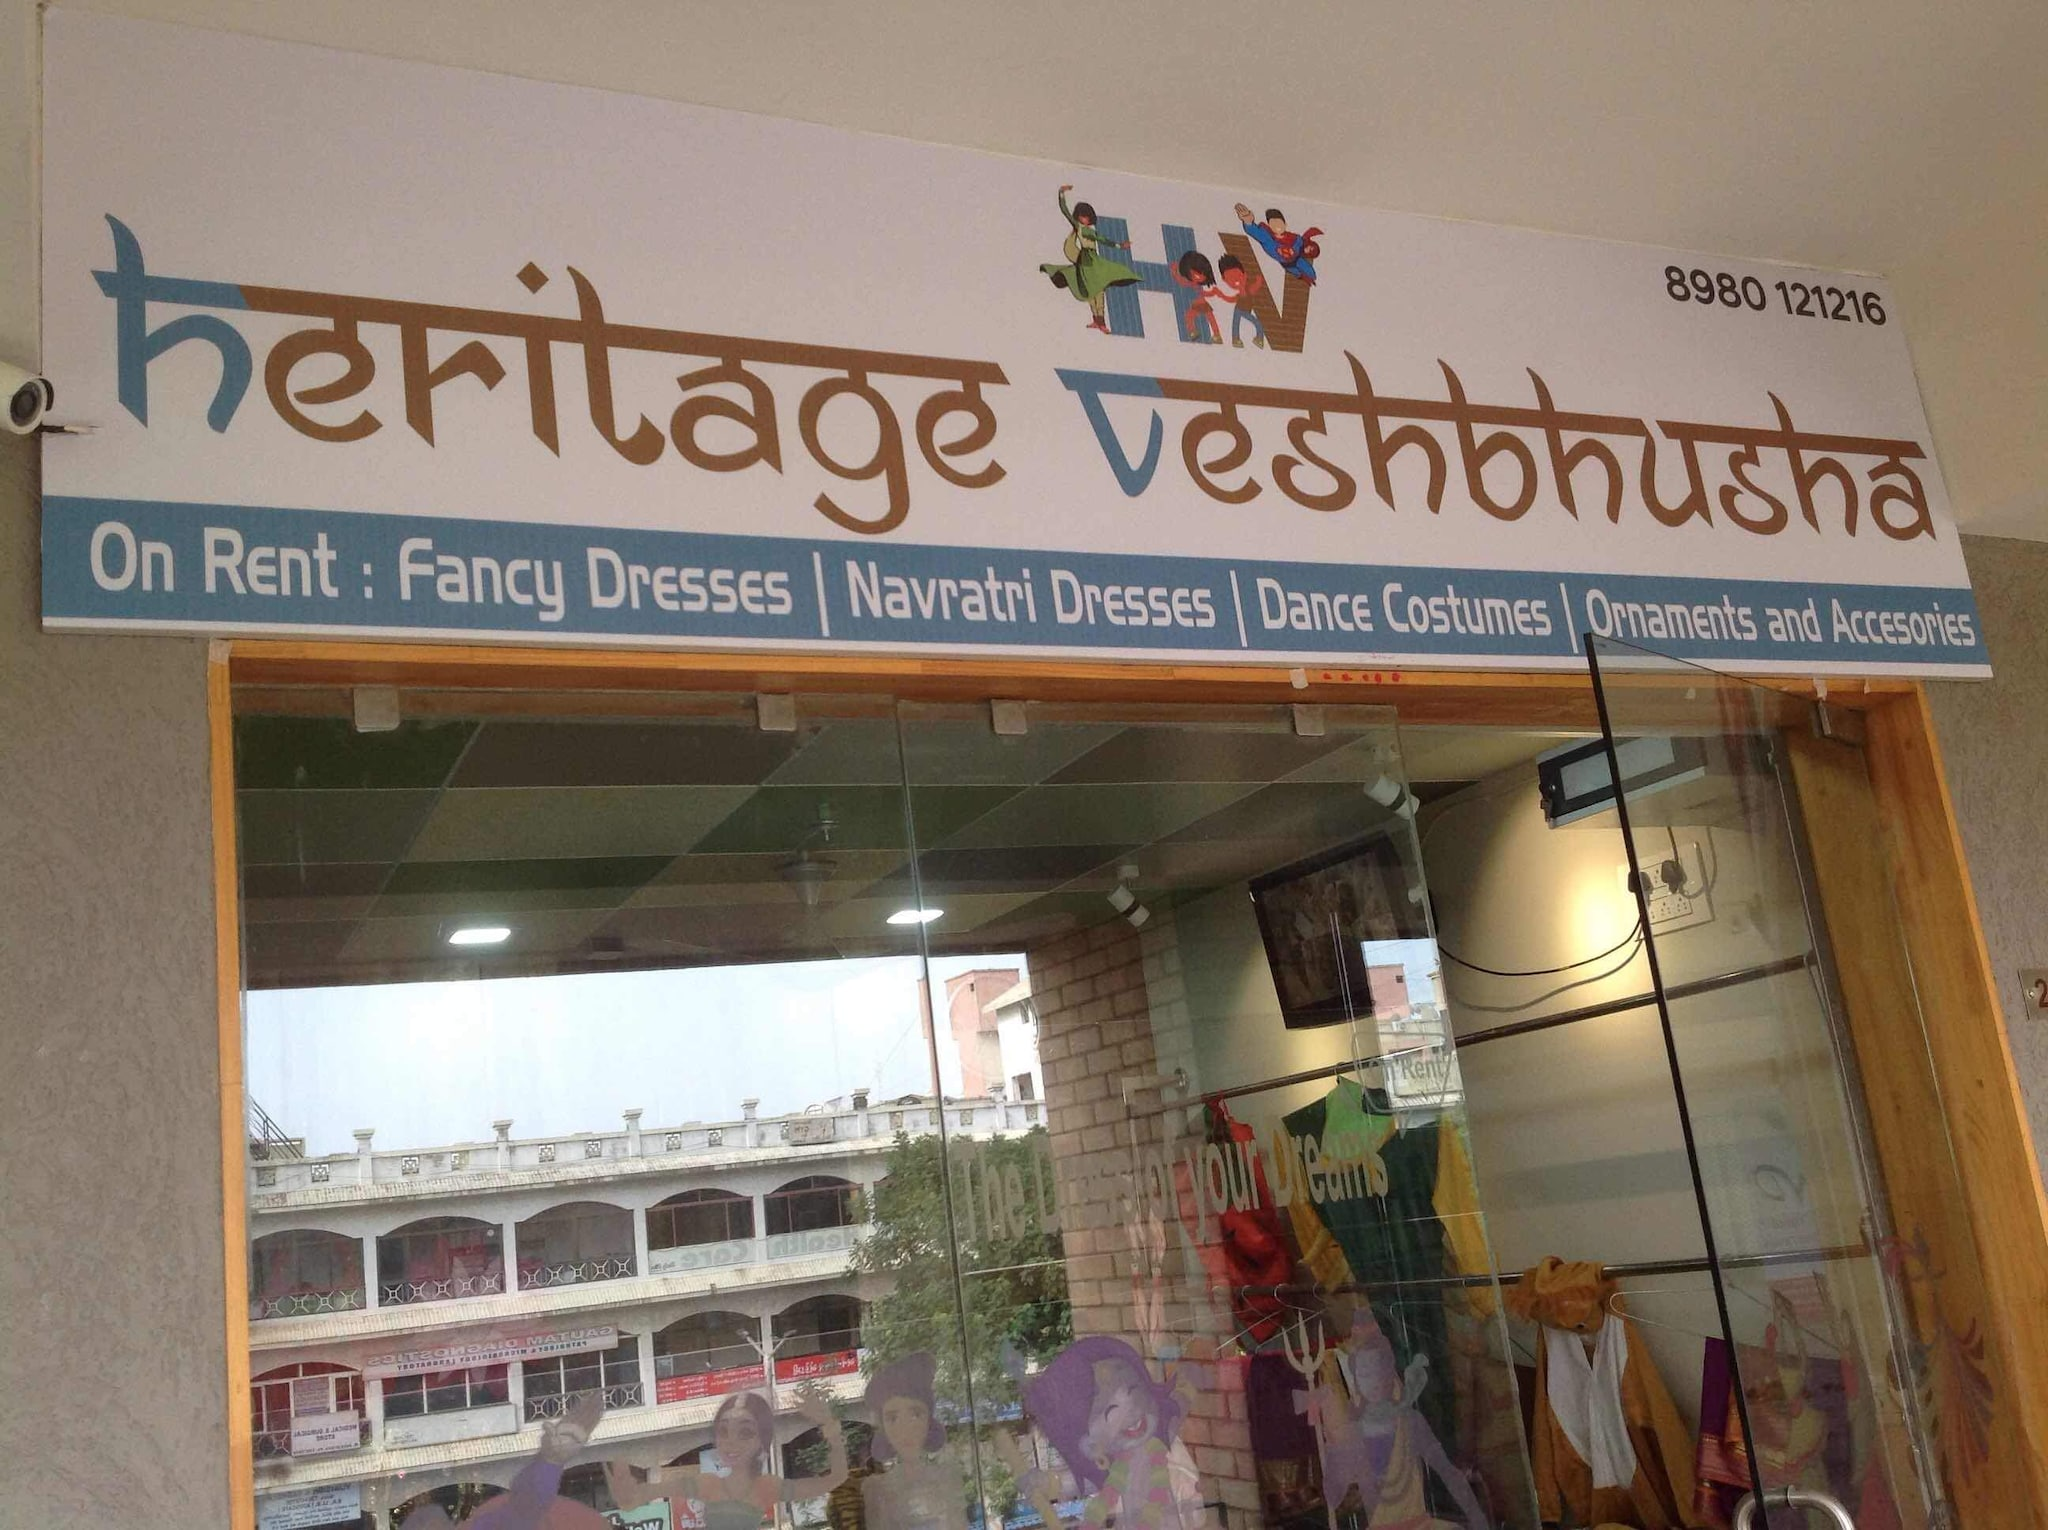 8276cd62e8 Top 50 Costume Rental in Ahmedabad - Best Fancy Dress Rental - Justdial